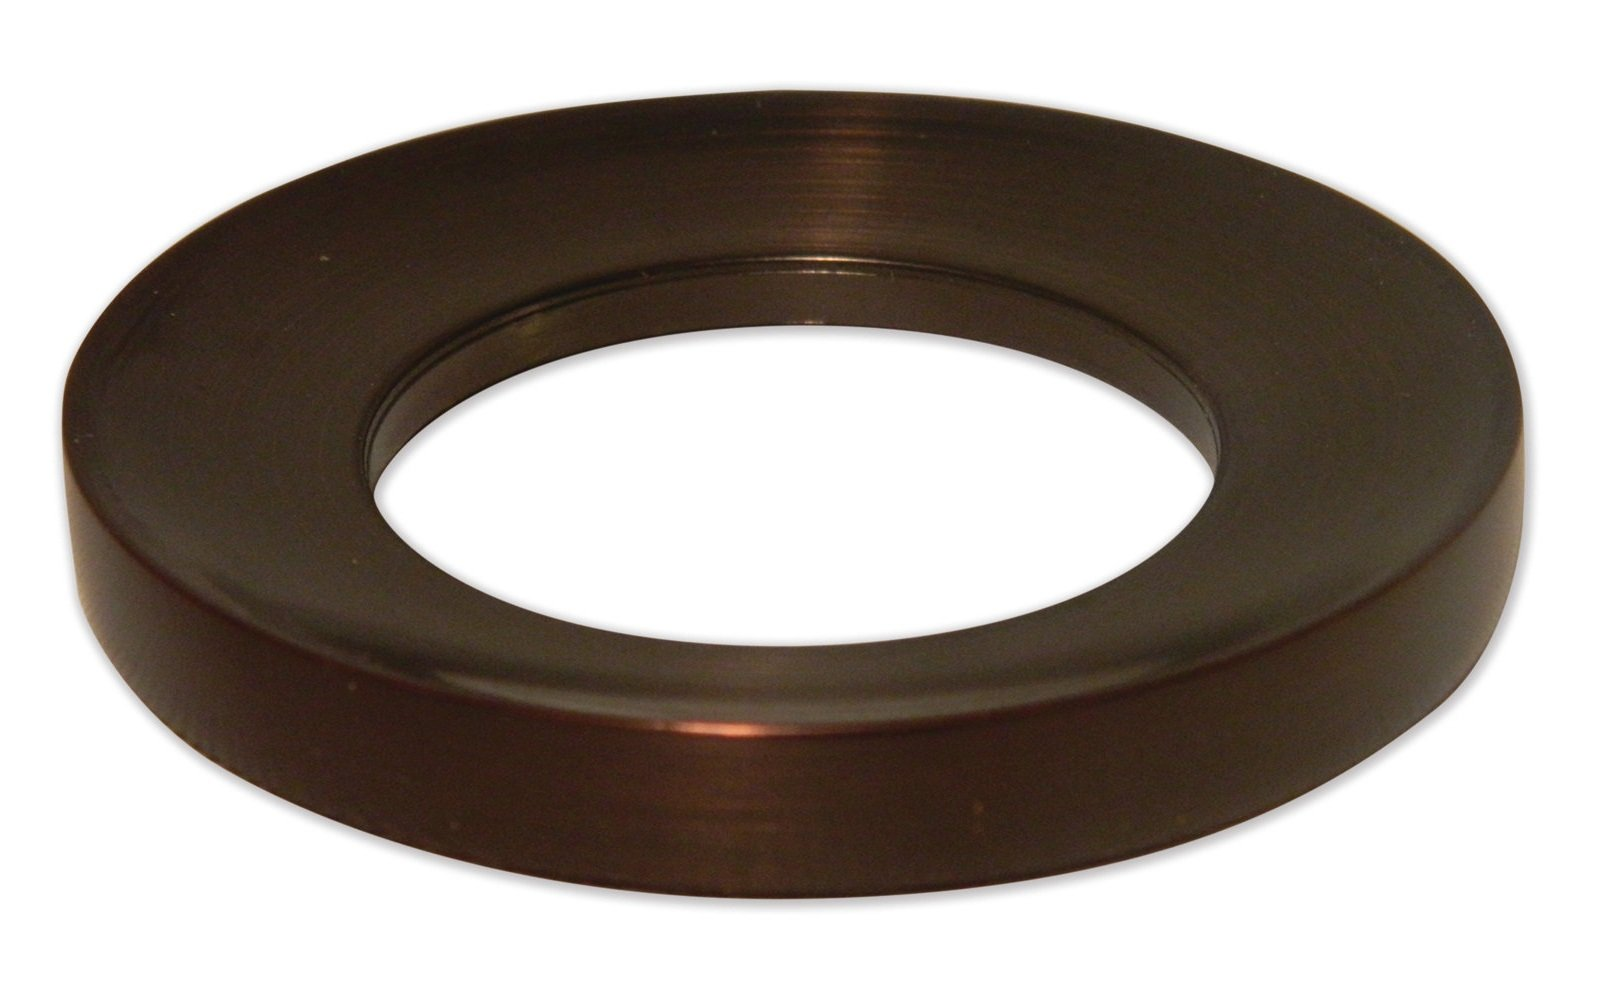 Eden Bath MR01RB Vessel Sink Mounting Ring - Oil Rubbed Bronze